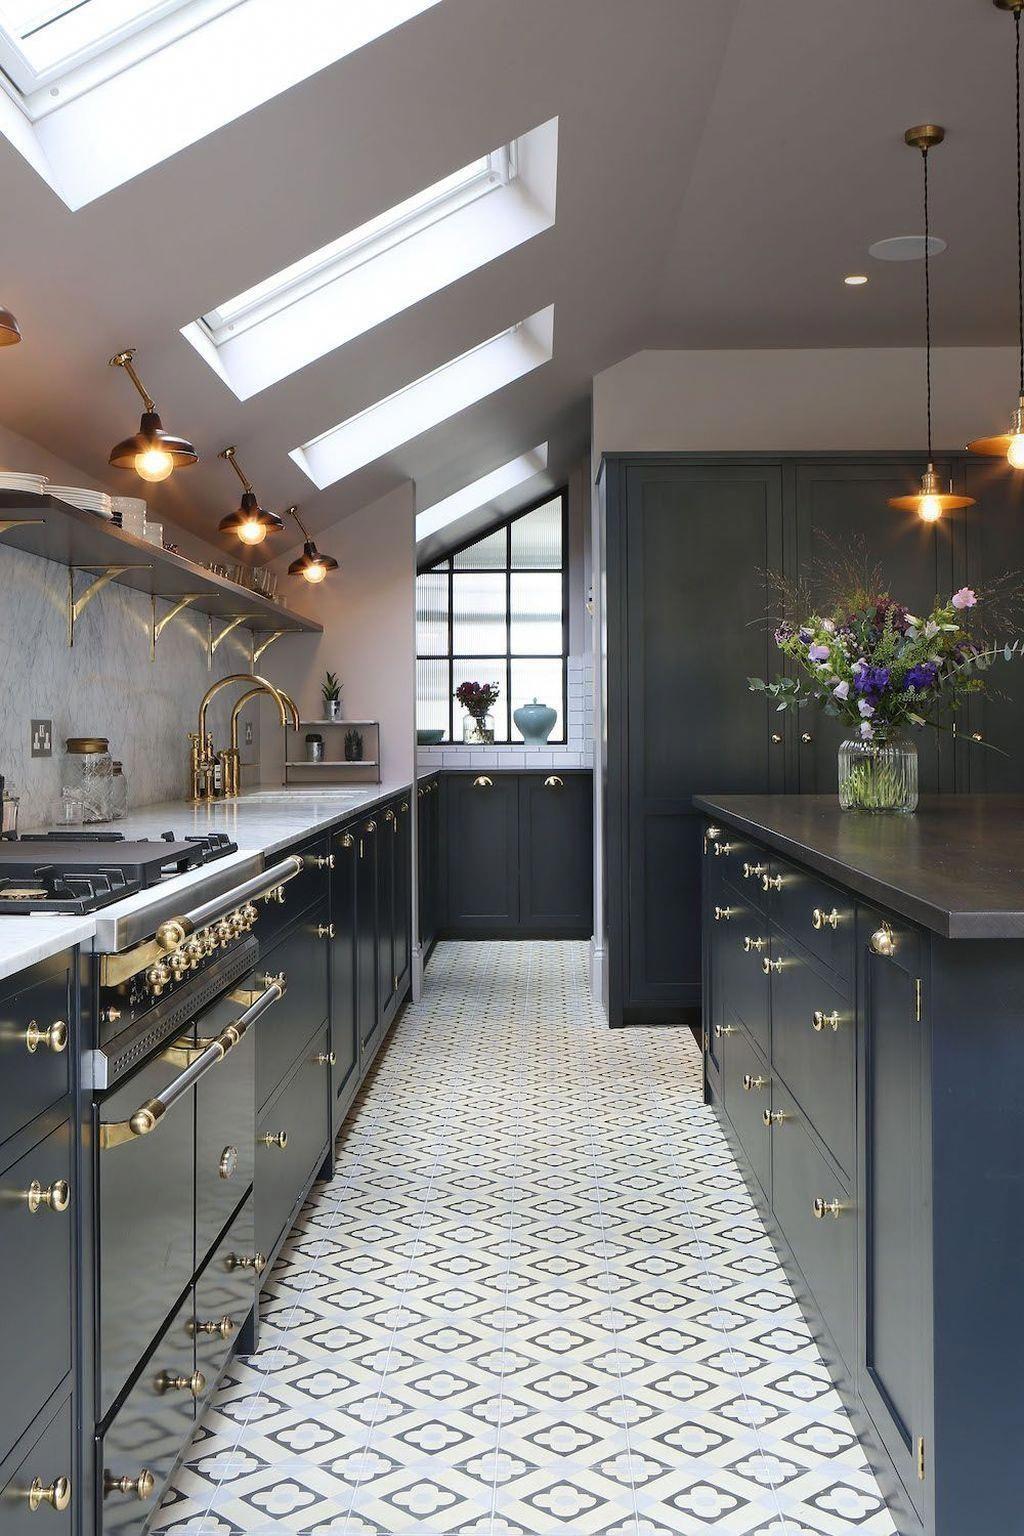 35 elegant kitchen lighting design ideas bestkitcheninterior kitchen lighting design elegant on kitchen ideas elegant id=49266